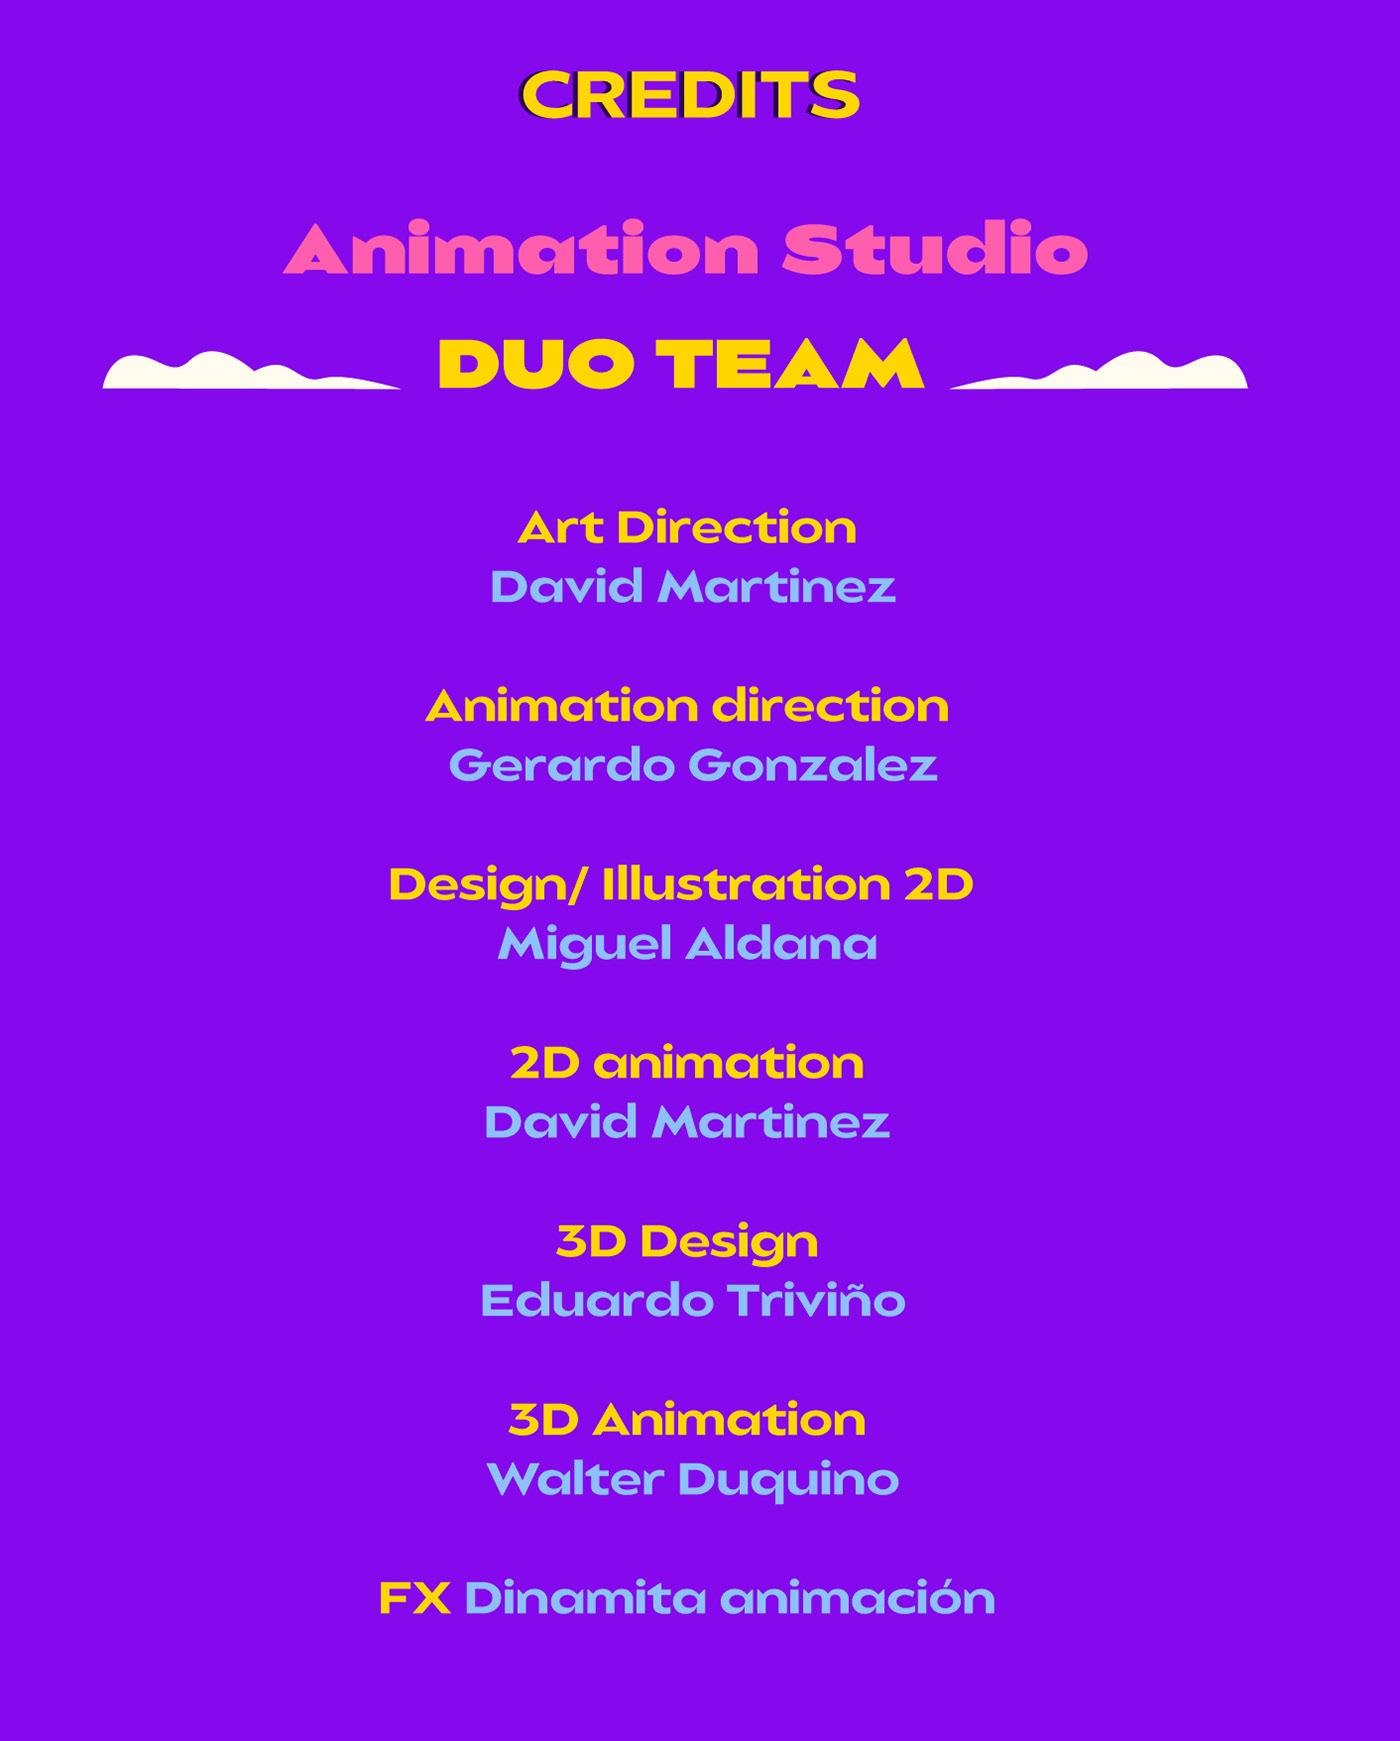 2D 3D animation  duo graphics motion studio team